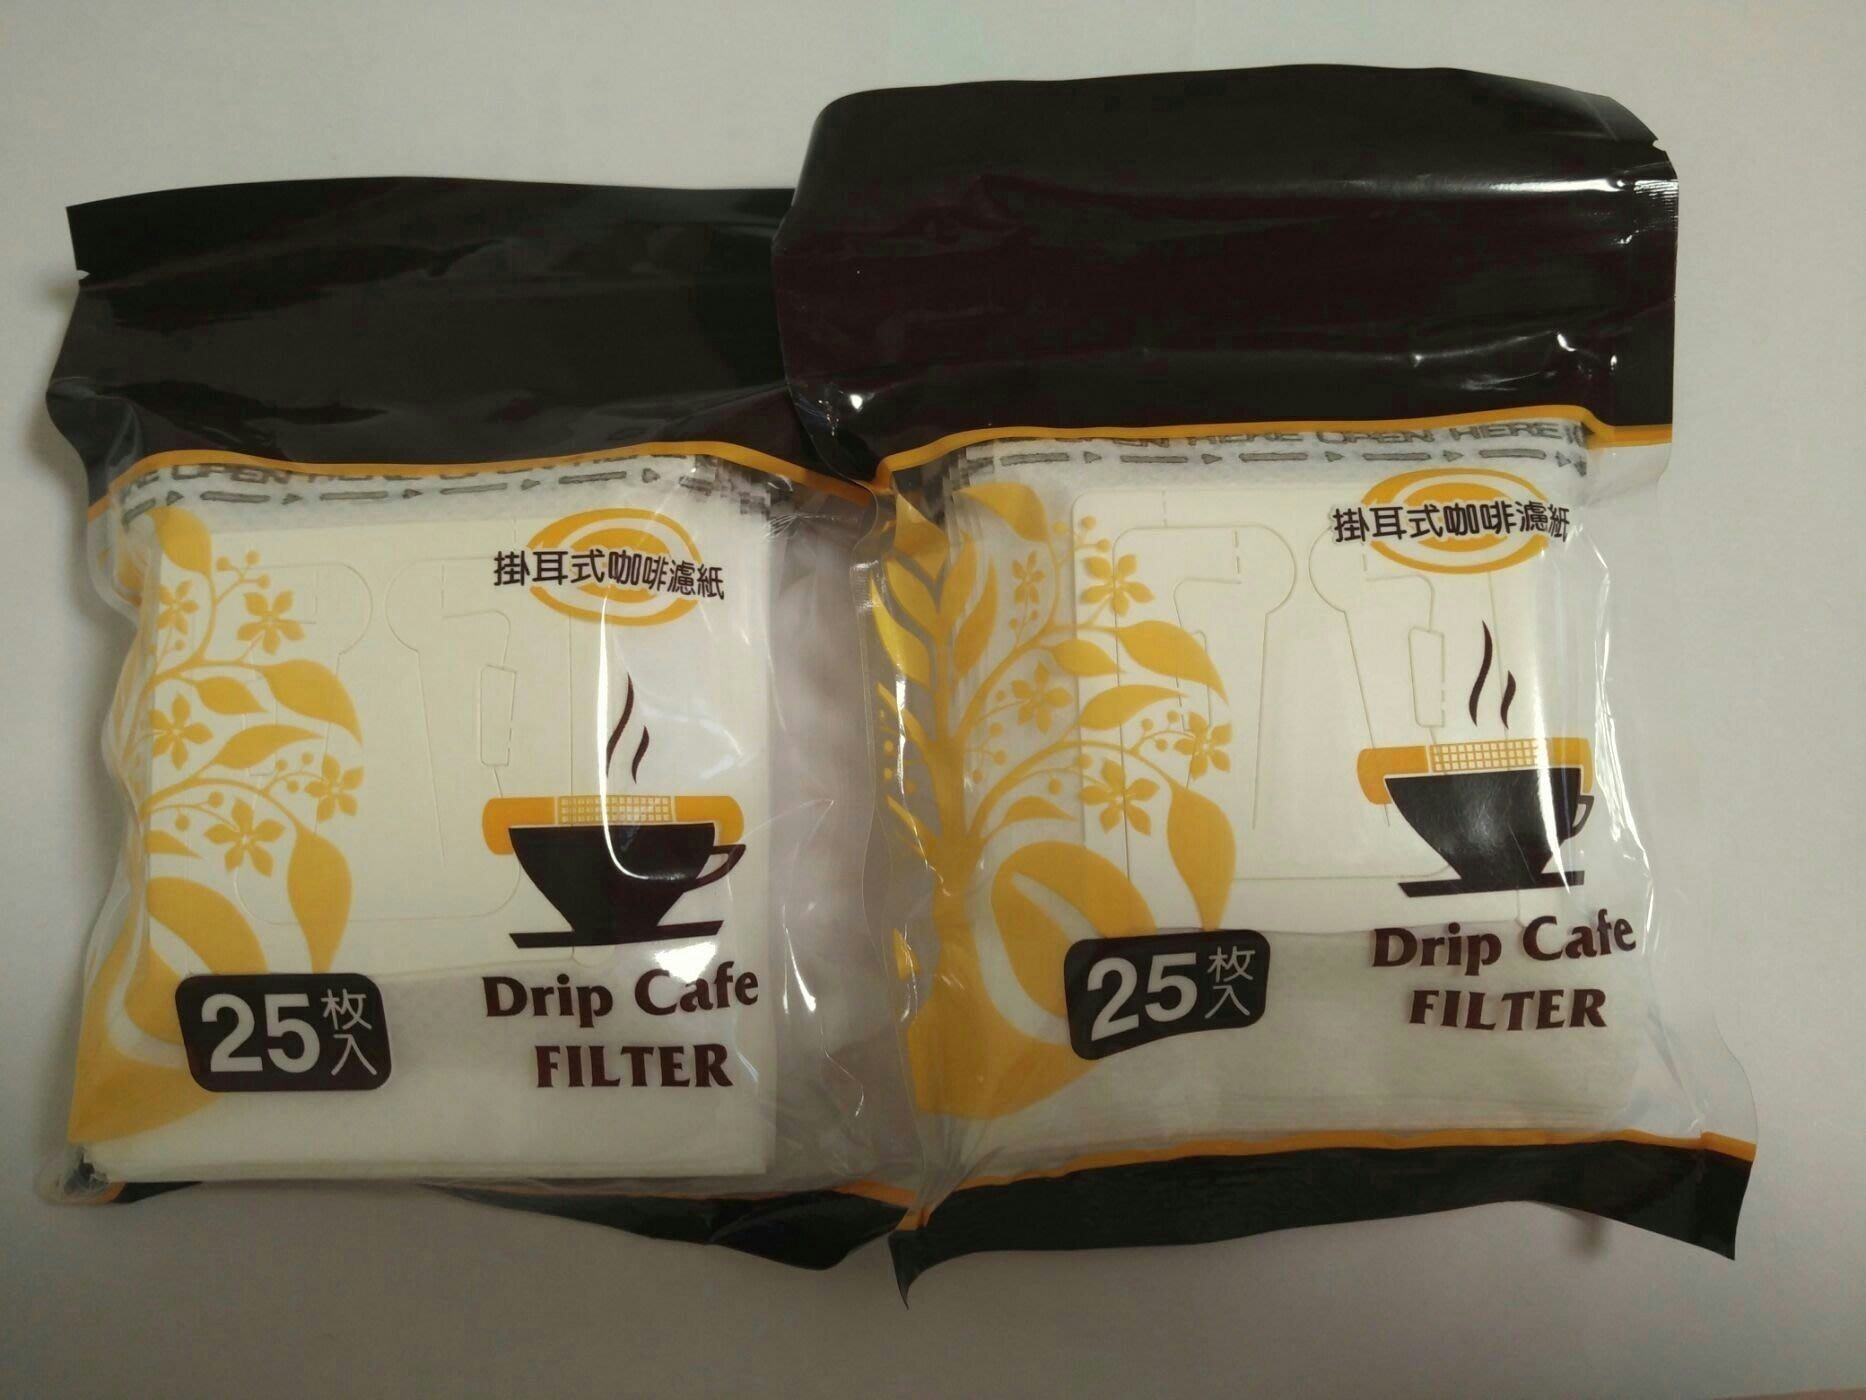 Drip Cafe 夾鏈袋 掛耳式 咖啡 濾紙 一式二包50入